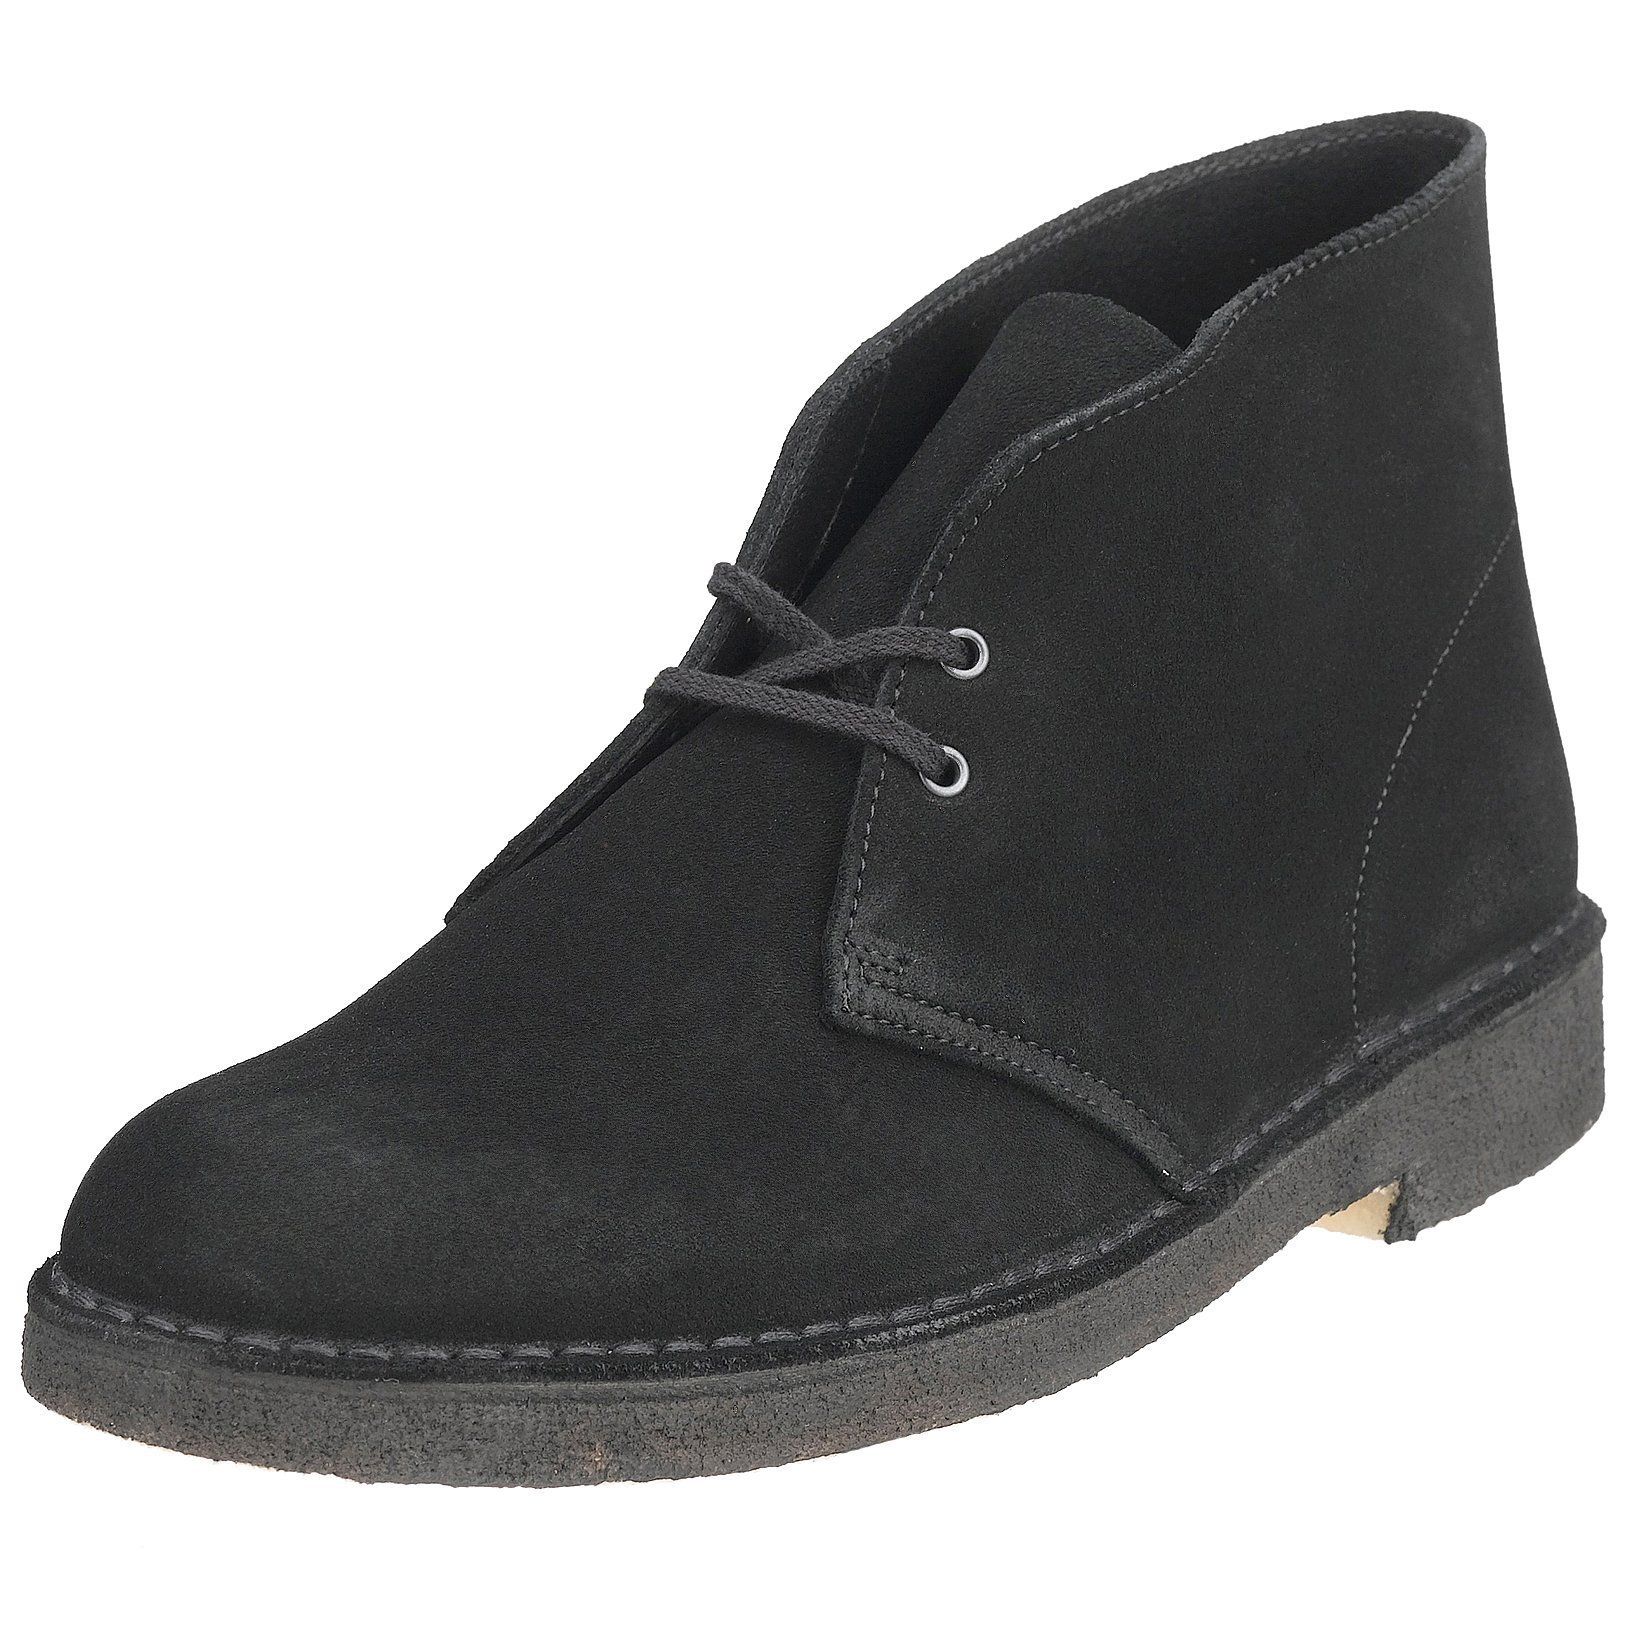 Clarks Originals Men's Desert Boot, Black Suede, 8 M